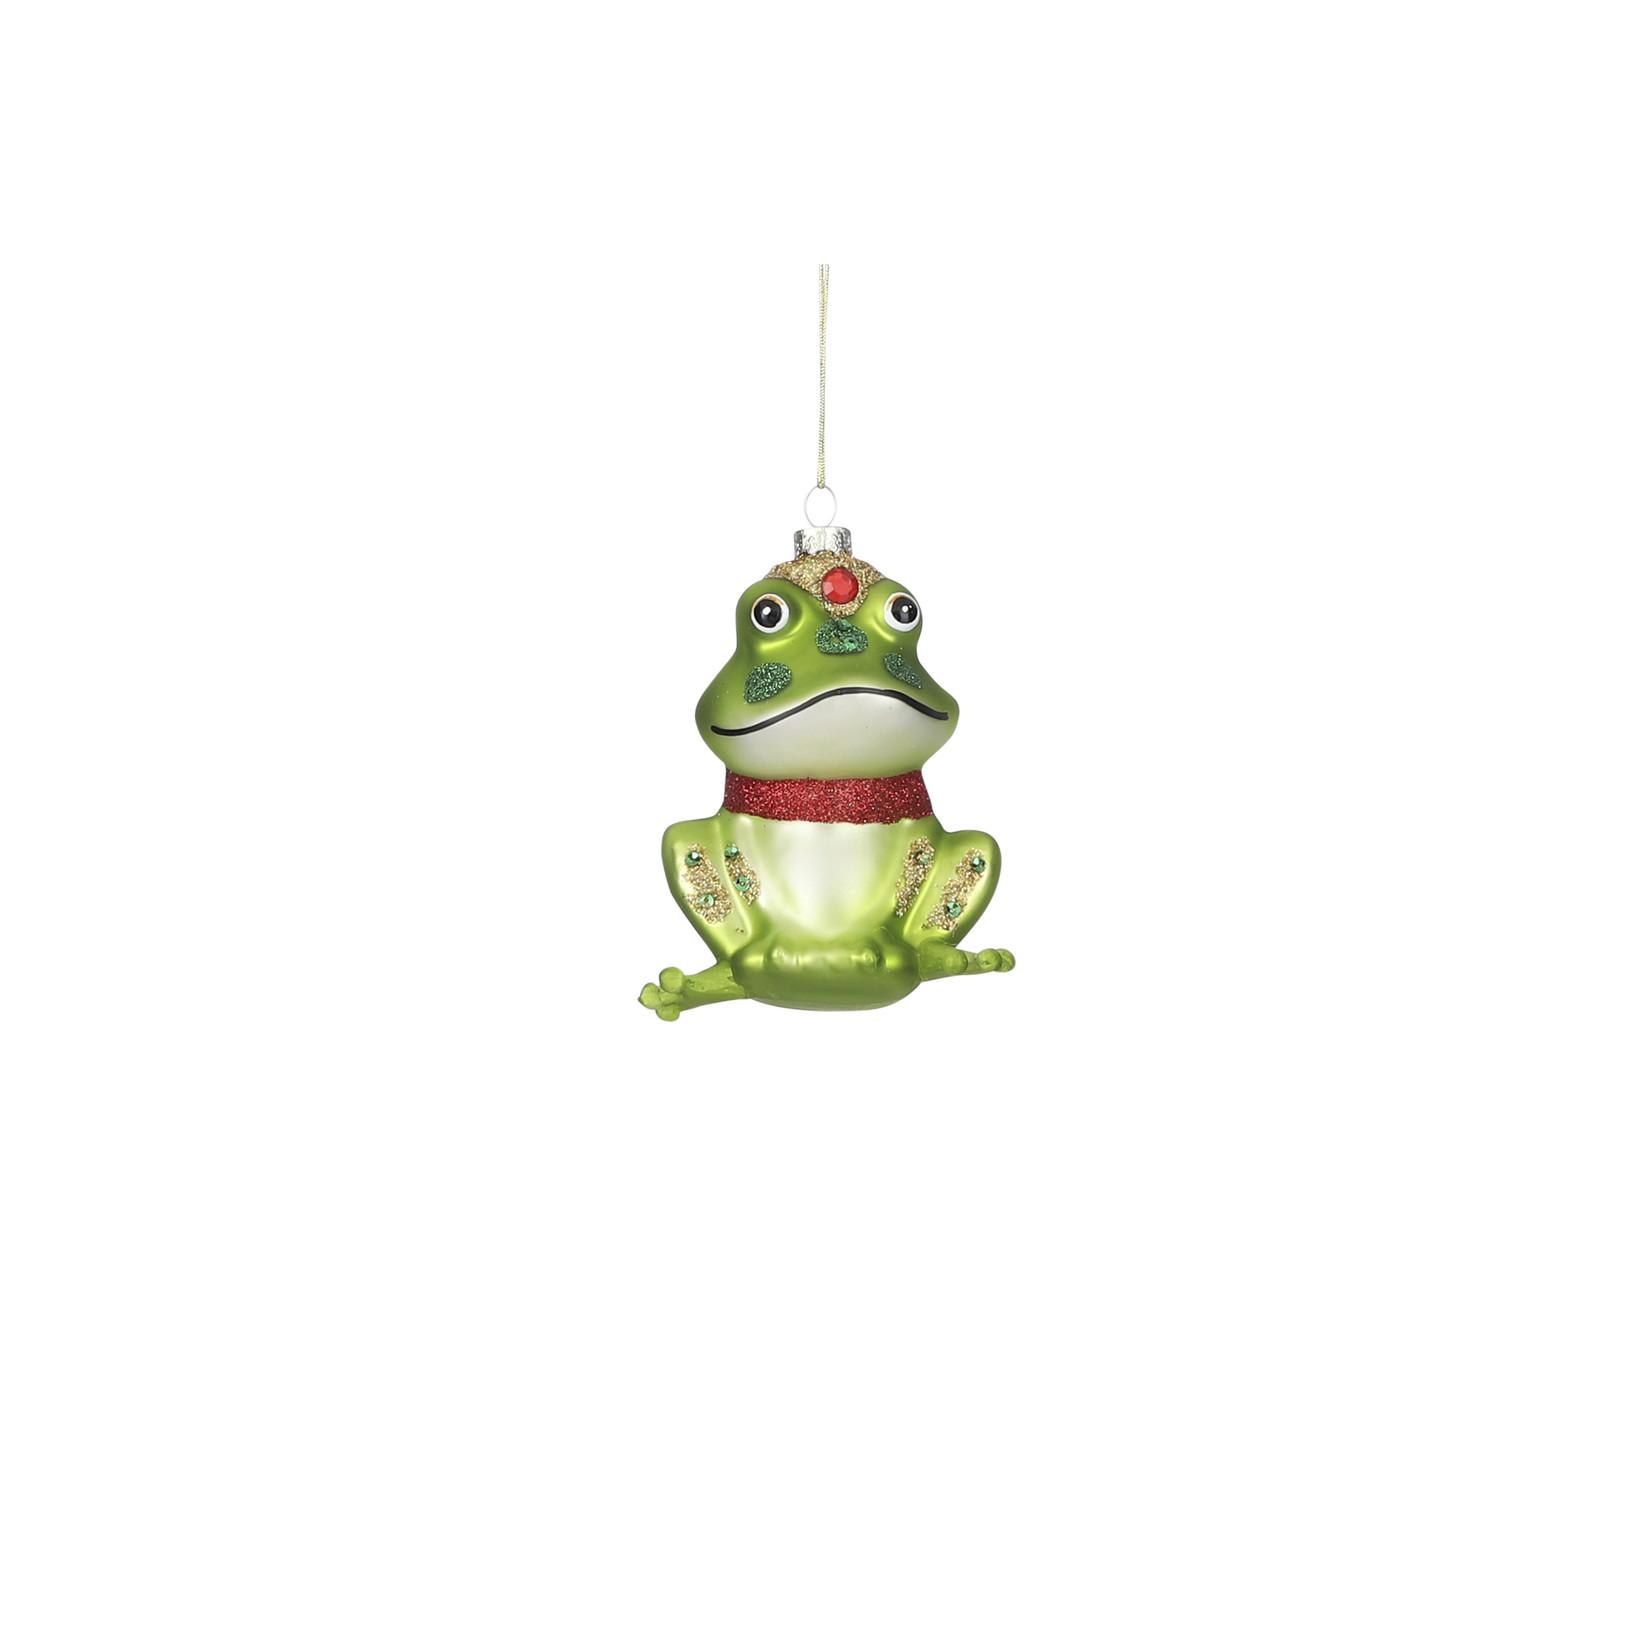 House of Seasons Ornament frog green